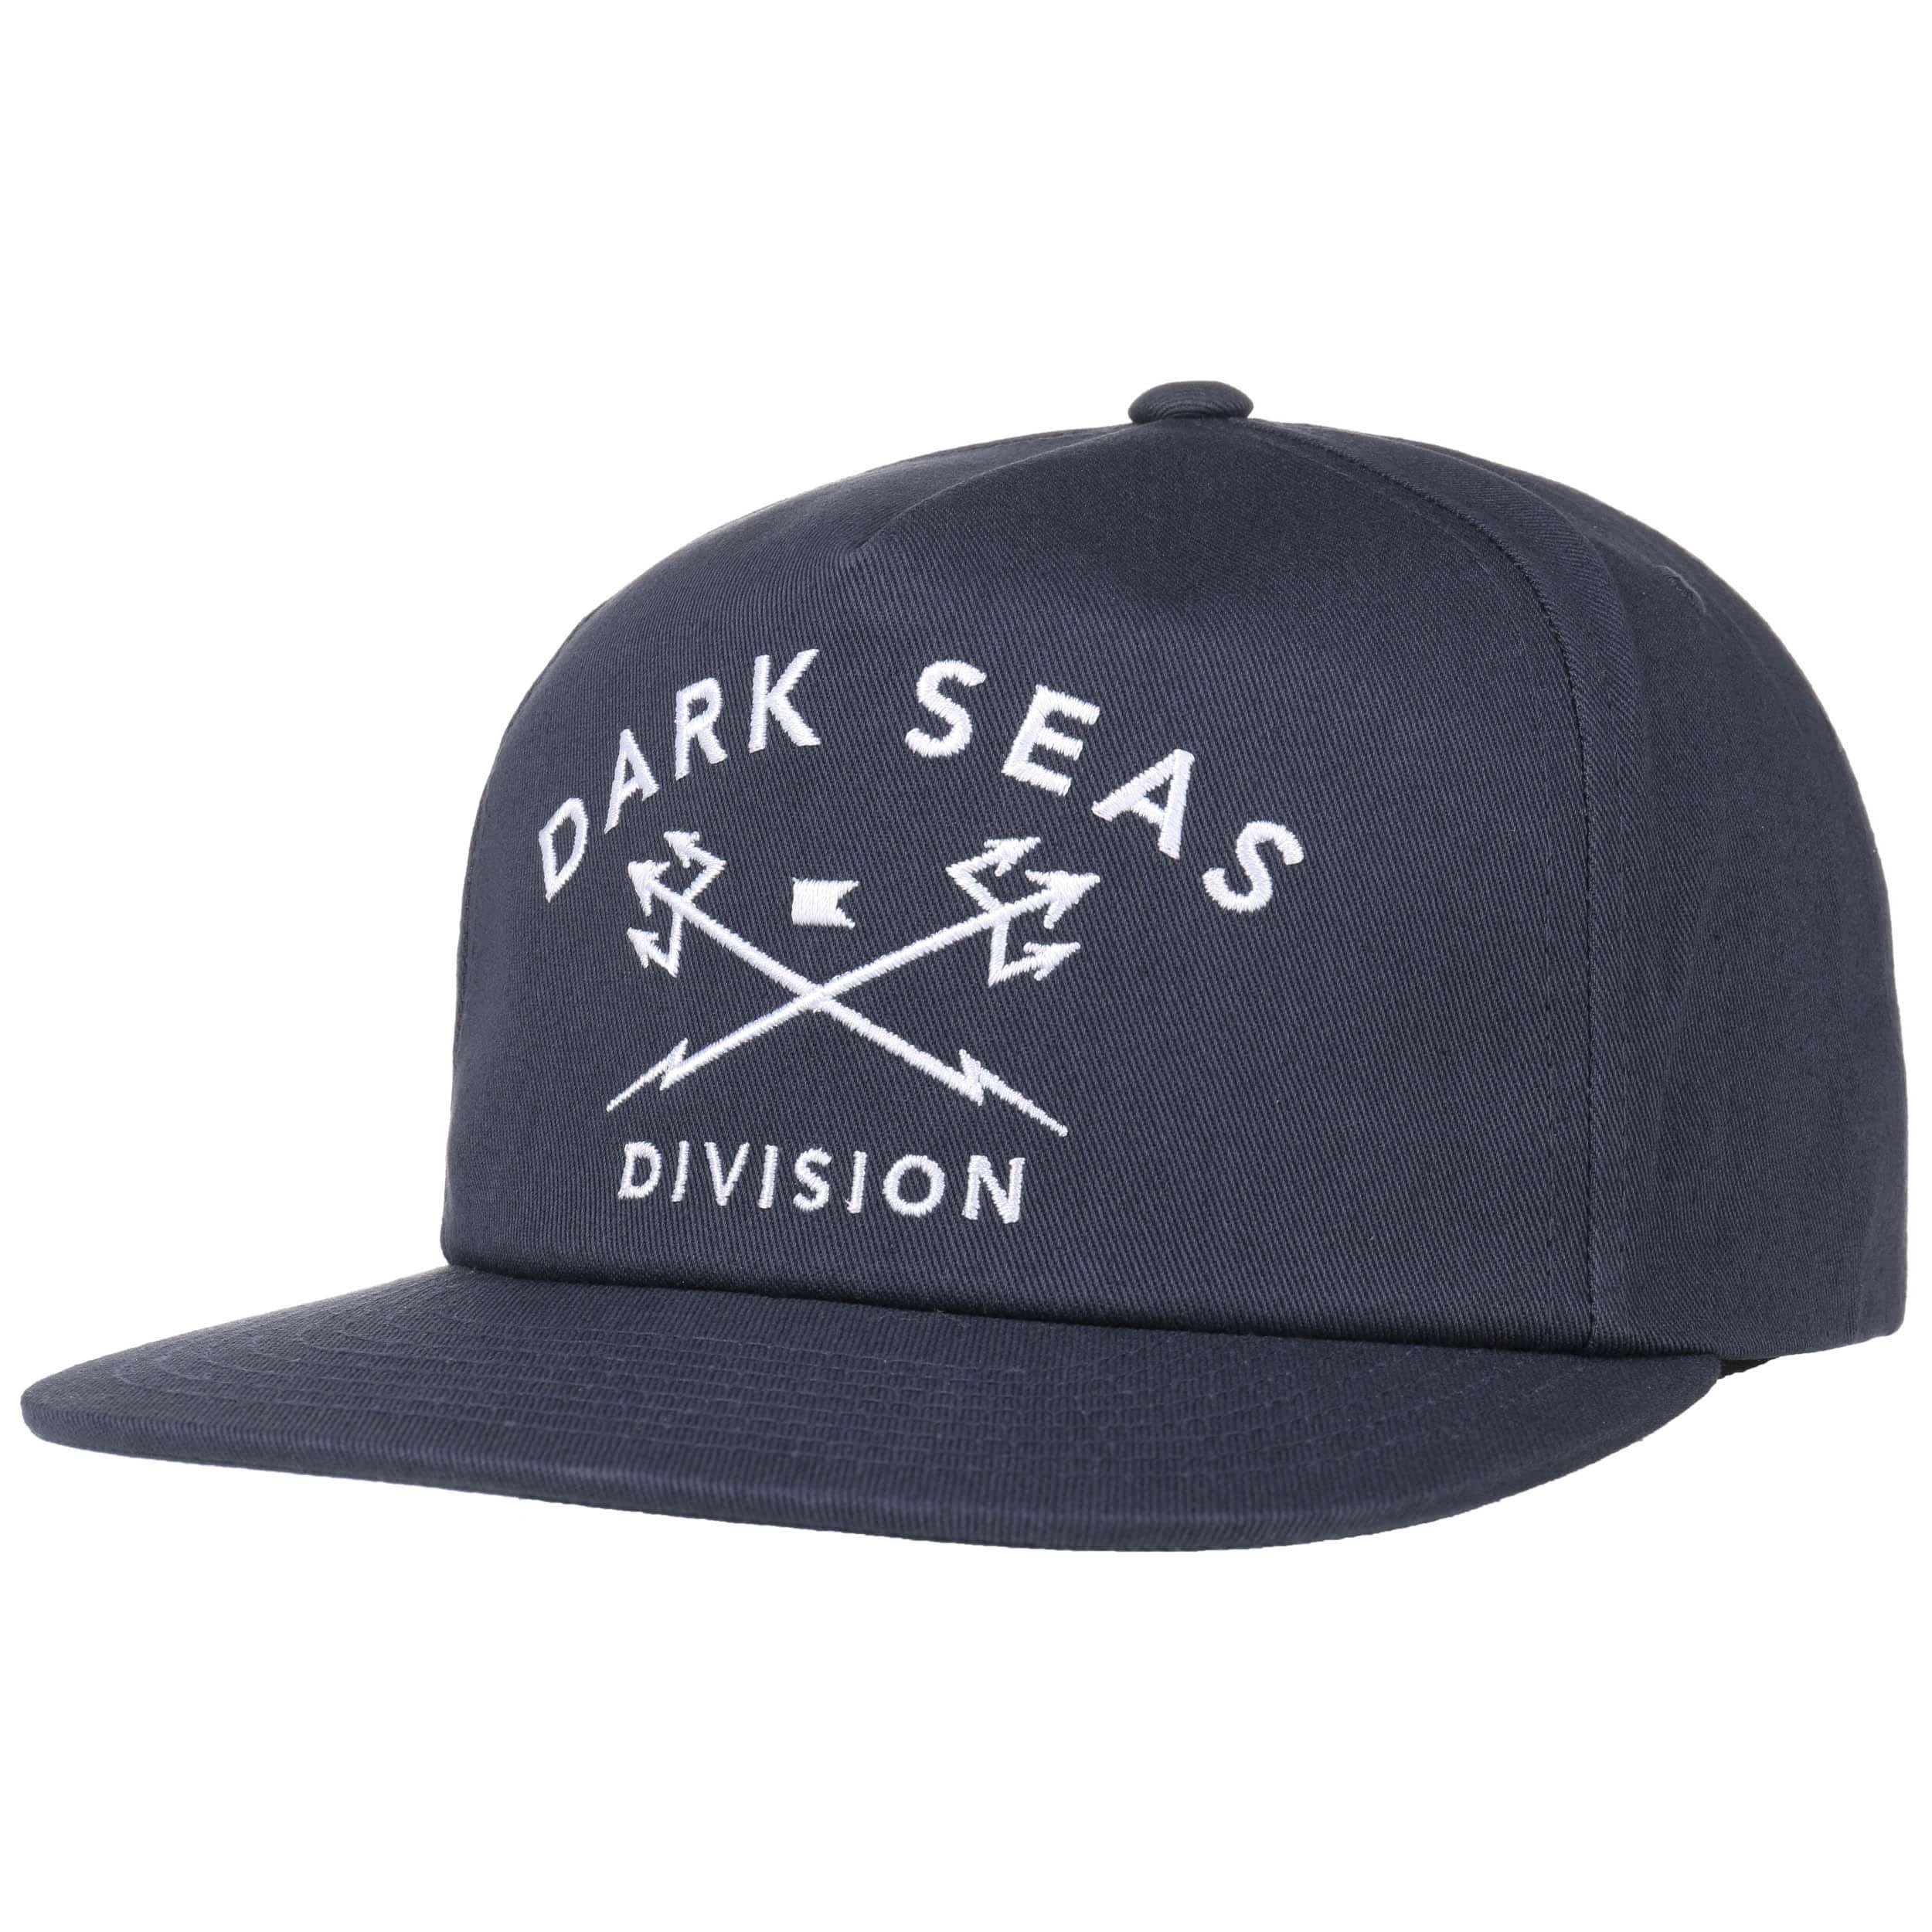 Snapback Cap Tridents by Dark Seas - 39,95 € e32eb9020173